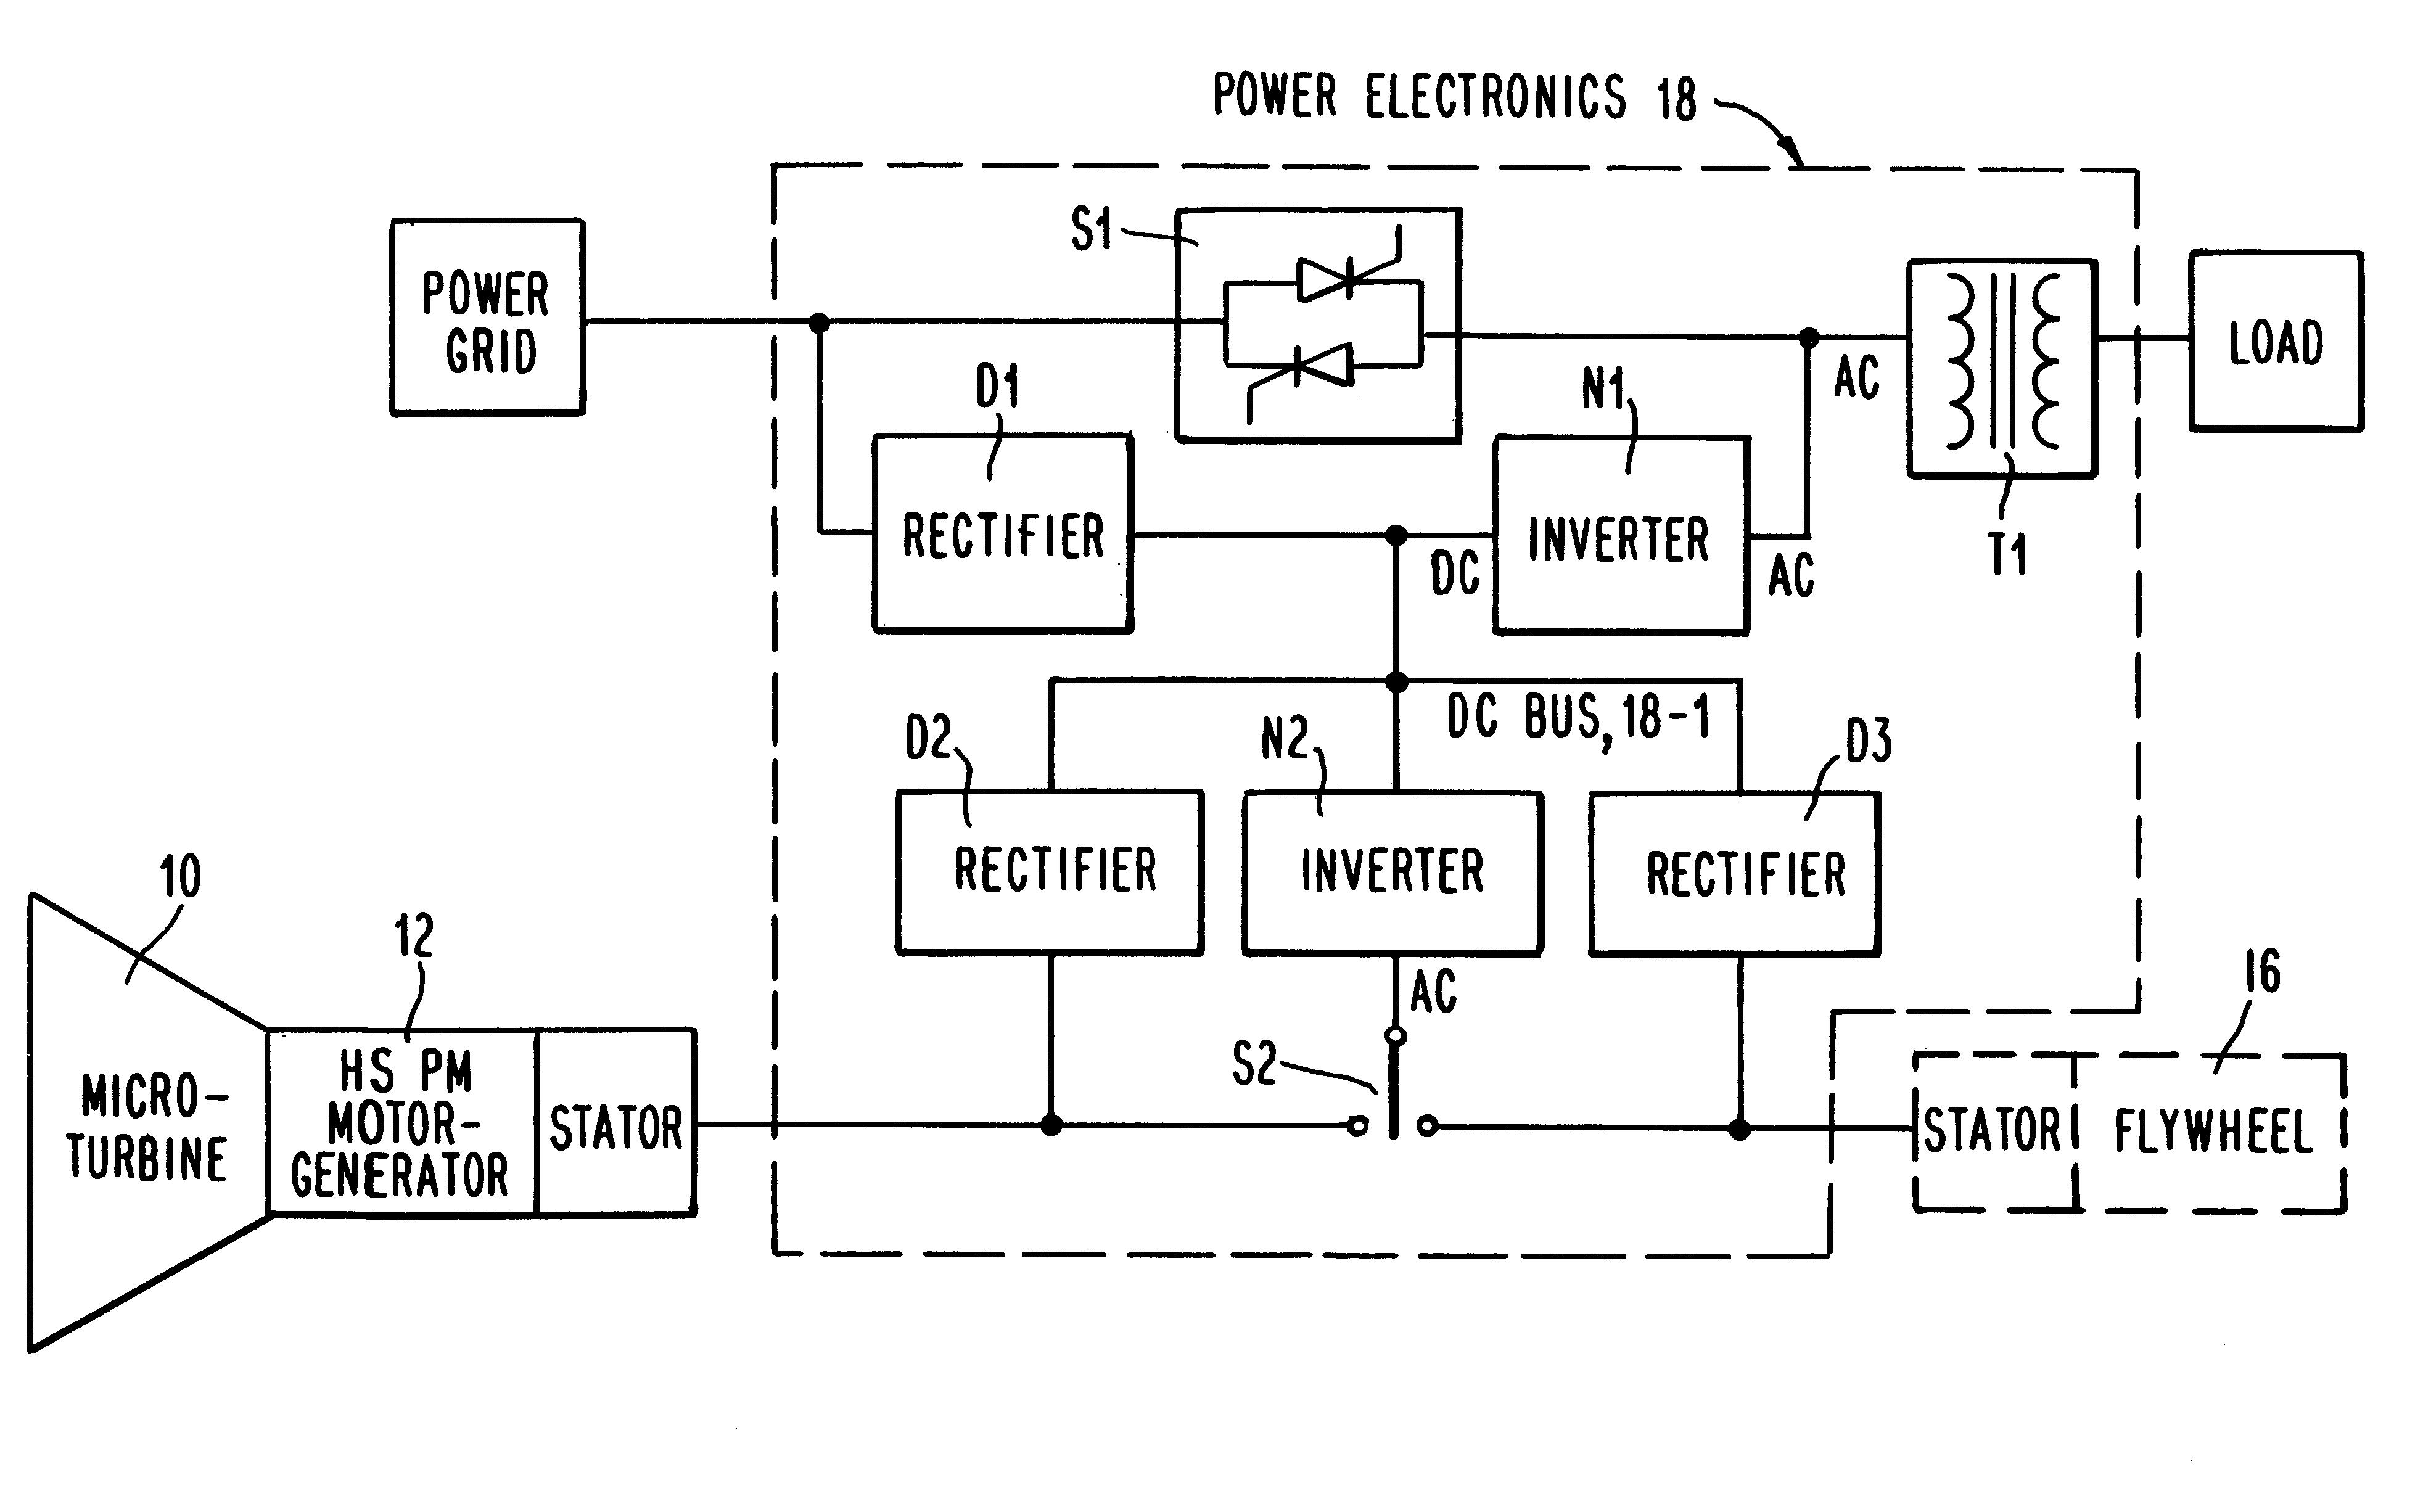 Patent US Flywheel microturbine system Google Patents